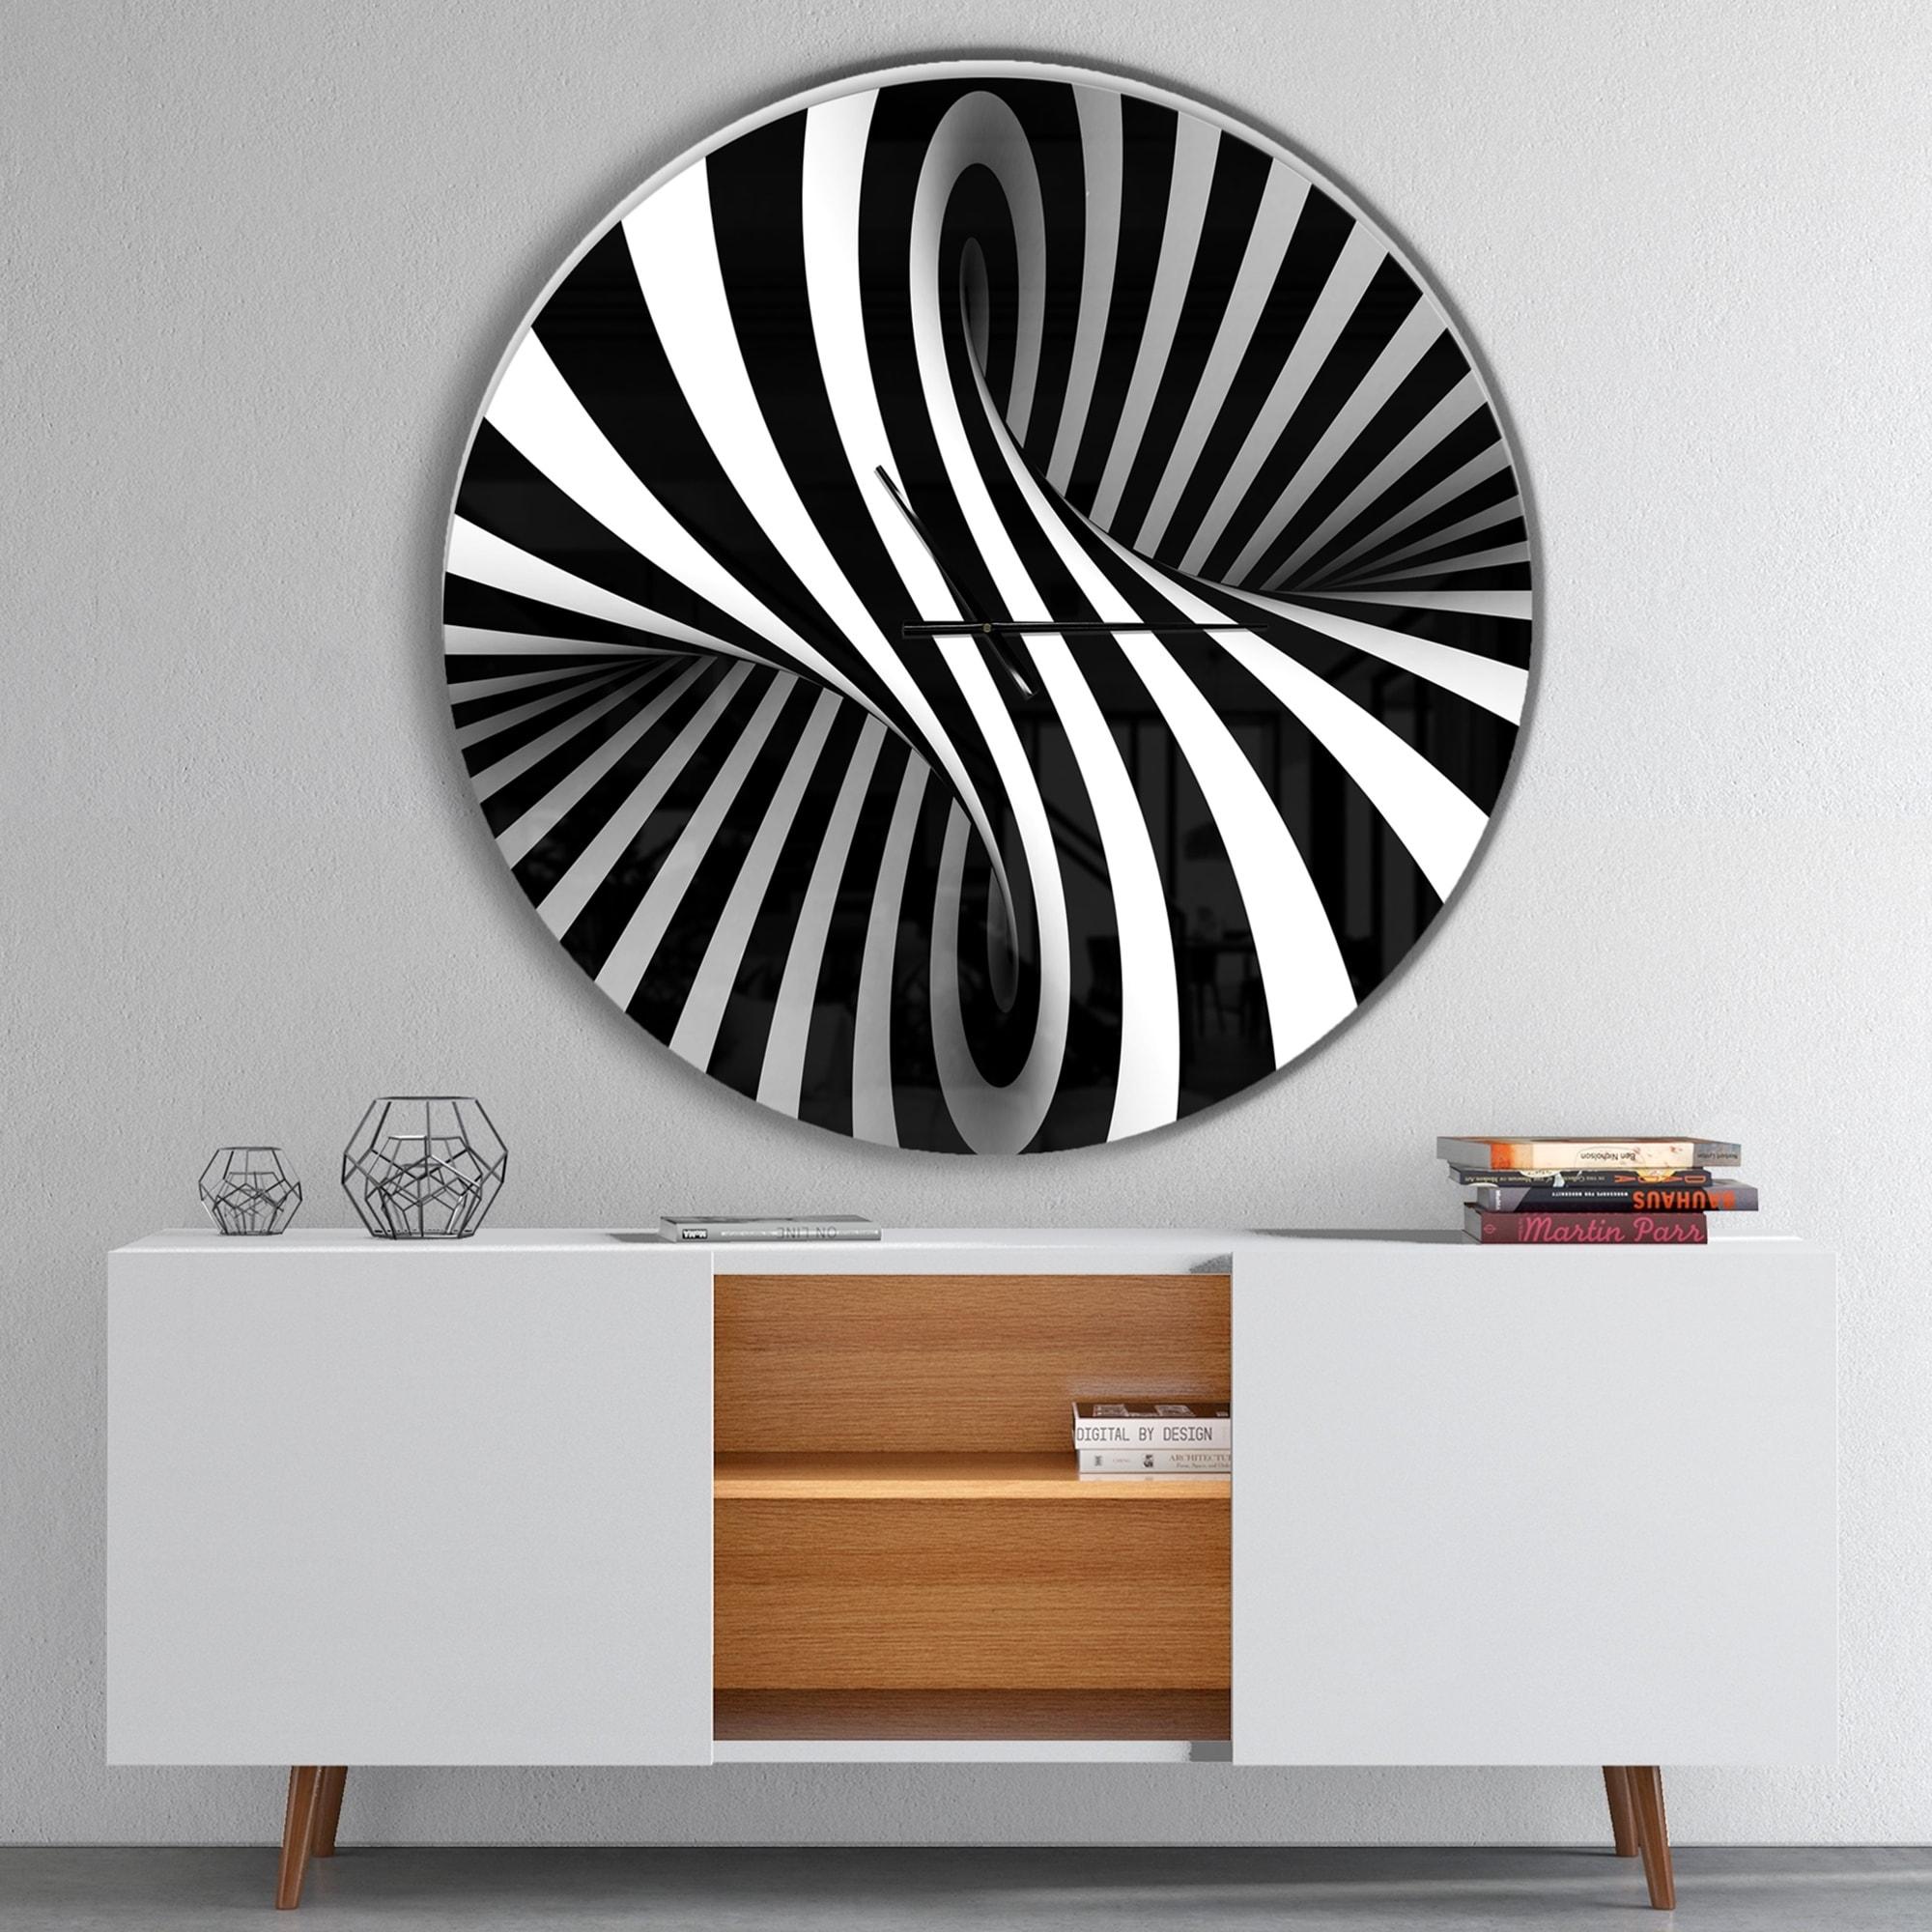 Clocks Modern Wall Clock Contemporary Kitchen Decor Black And White Abstract Accent Home Furniture Diy Quatrok Com Br